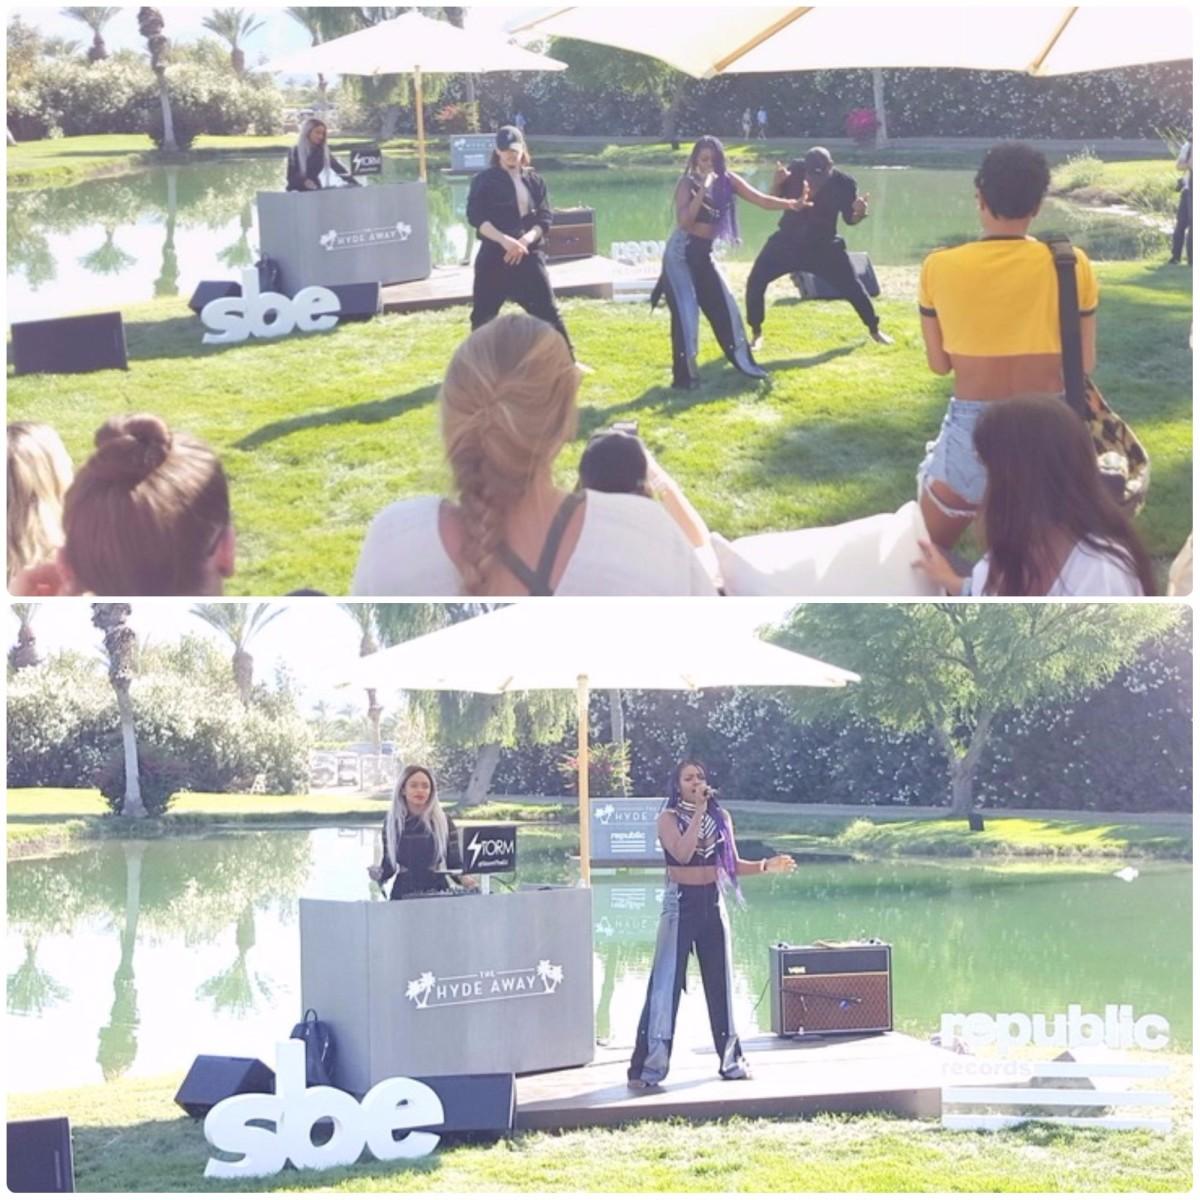 Justine Skye performing at The Hyde Away at Coachella 2017